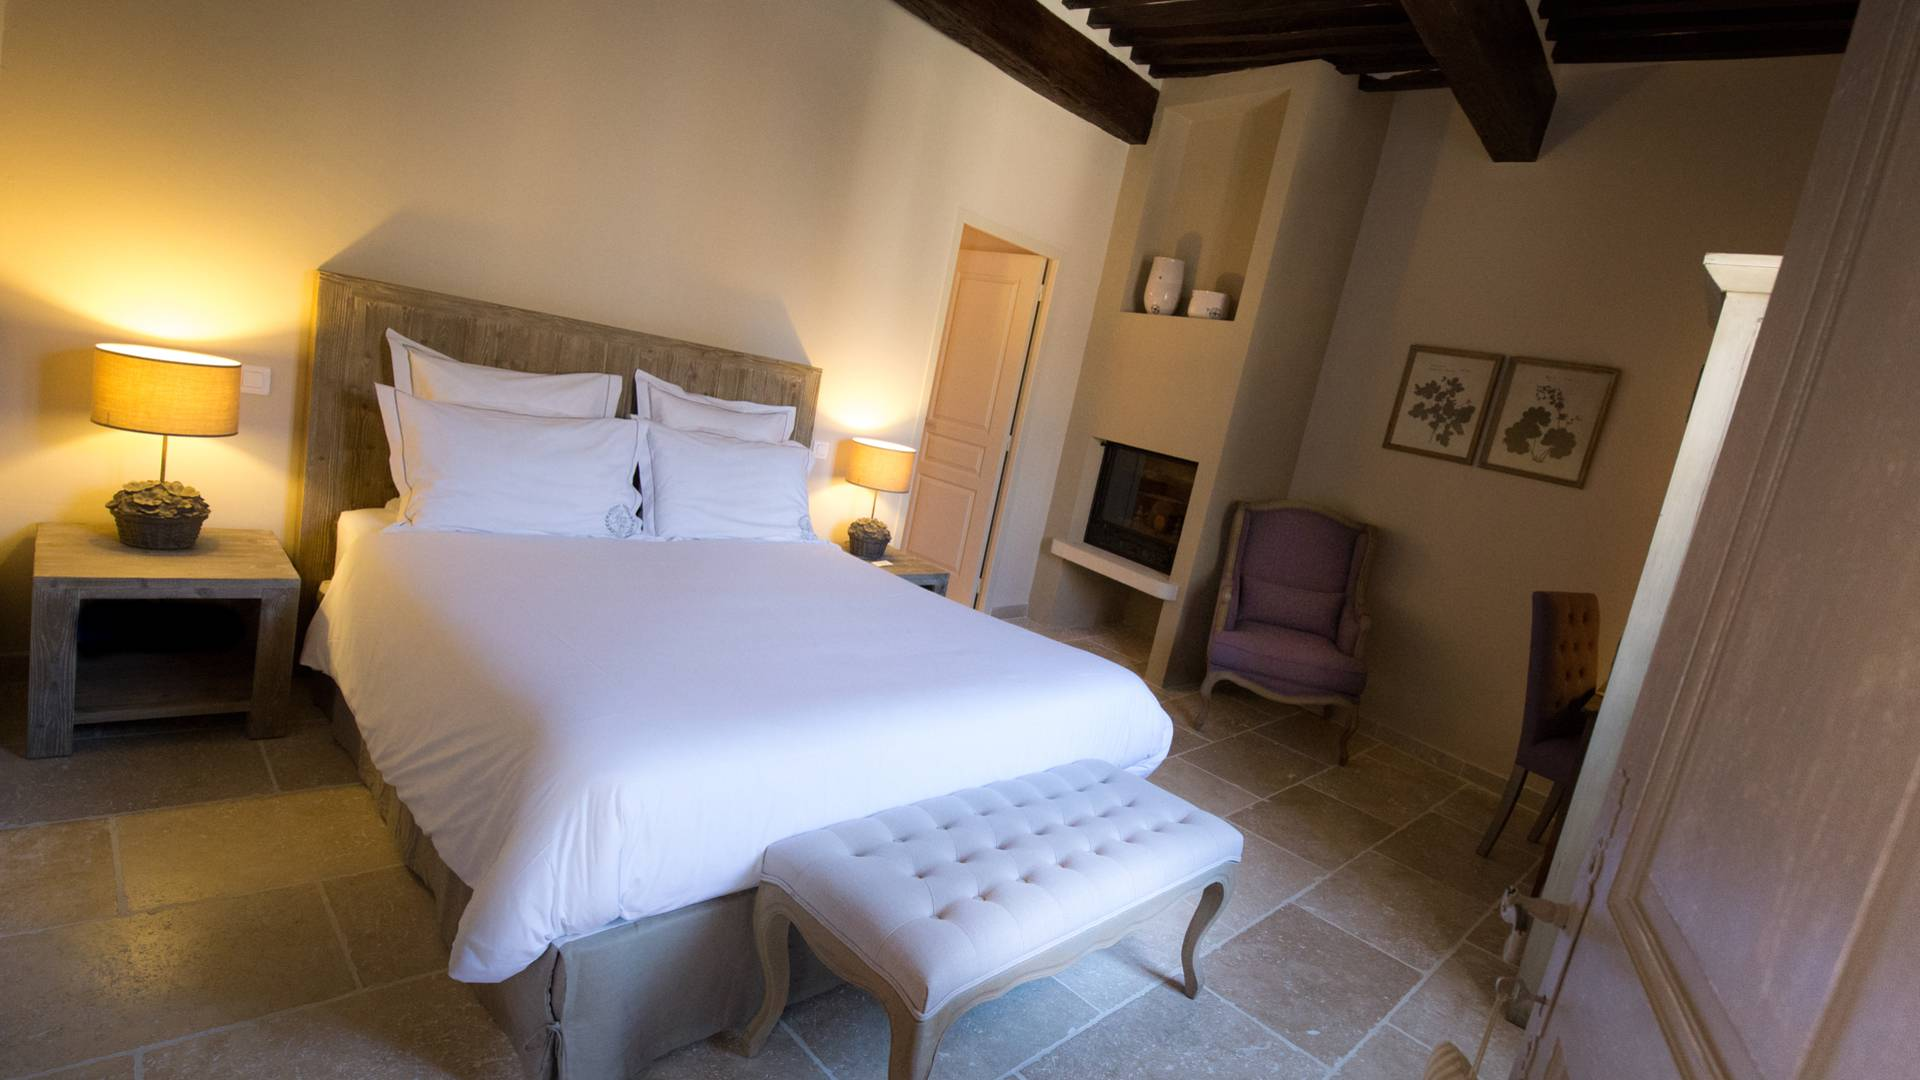 Chambres d'hôtes | La Bastide de Caseneuve |Chambre